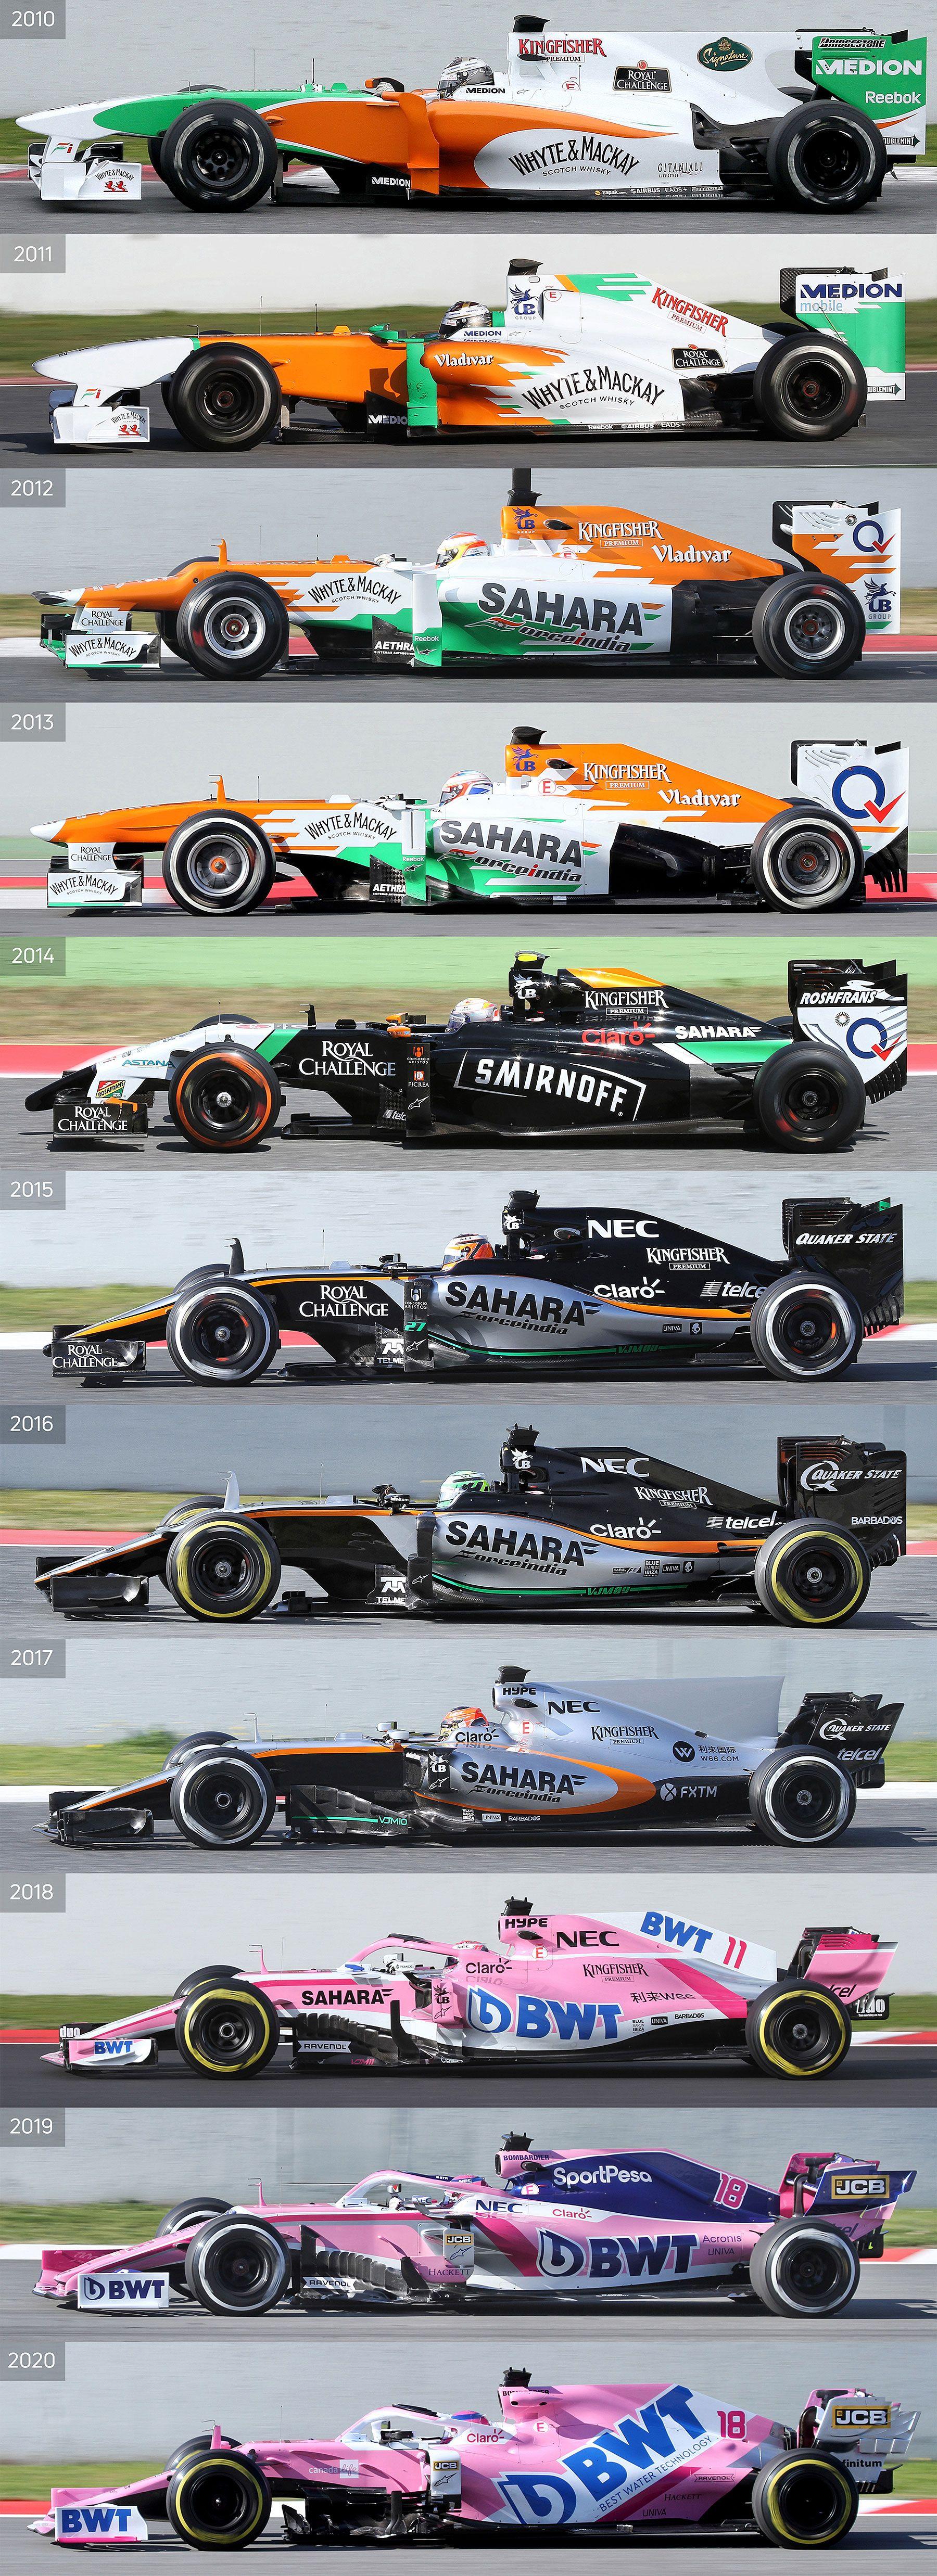 Mclaren 2010 2020 Formula 1 Car Mclaren Formula 1 Formula 1